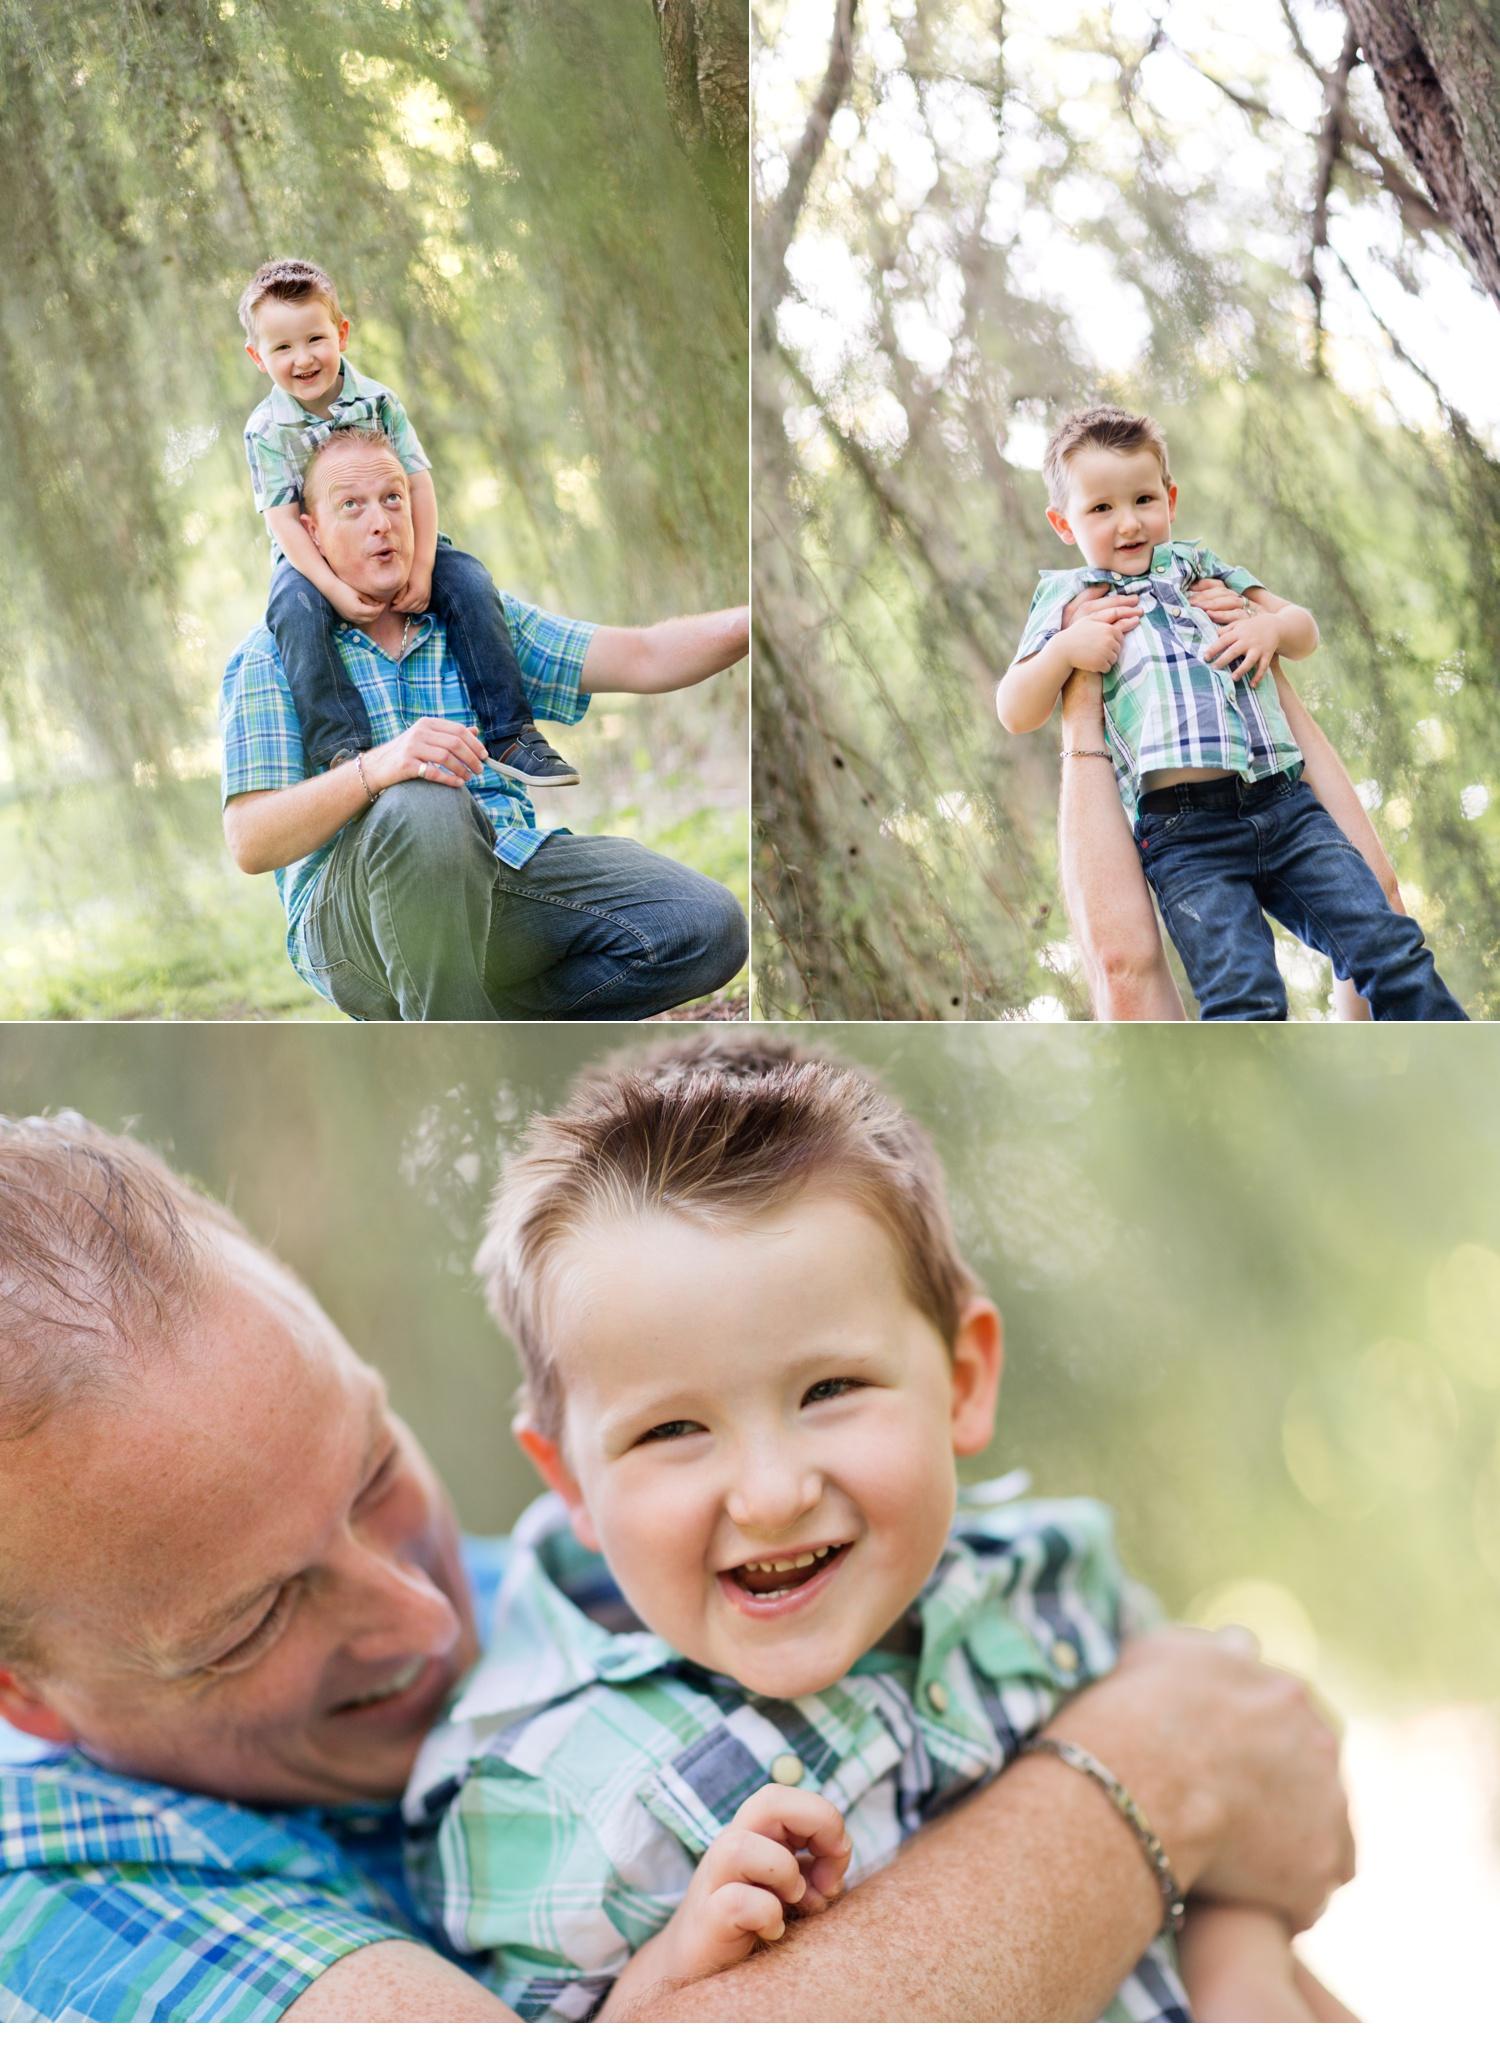 melbourne-family-photographer-capturing-joy.jpg